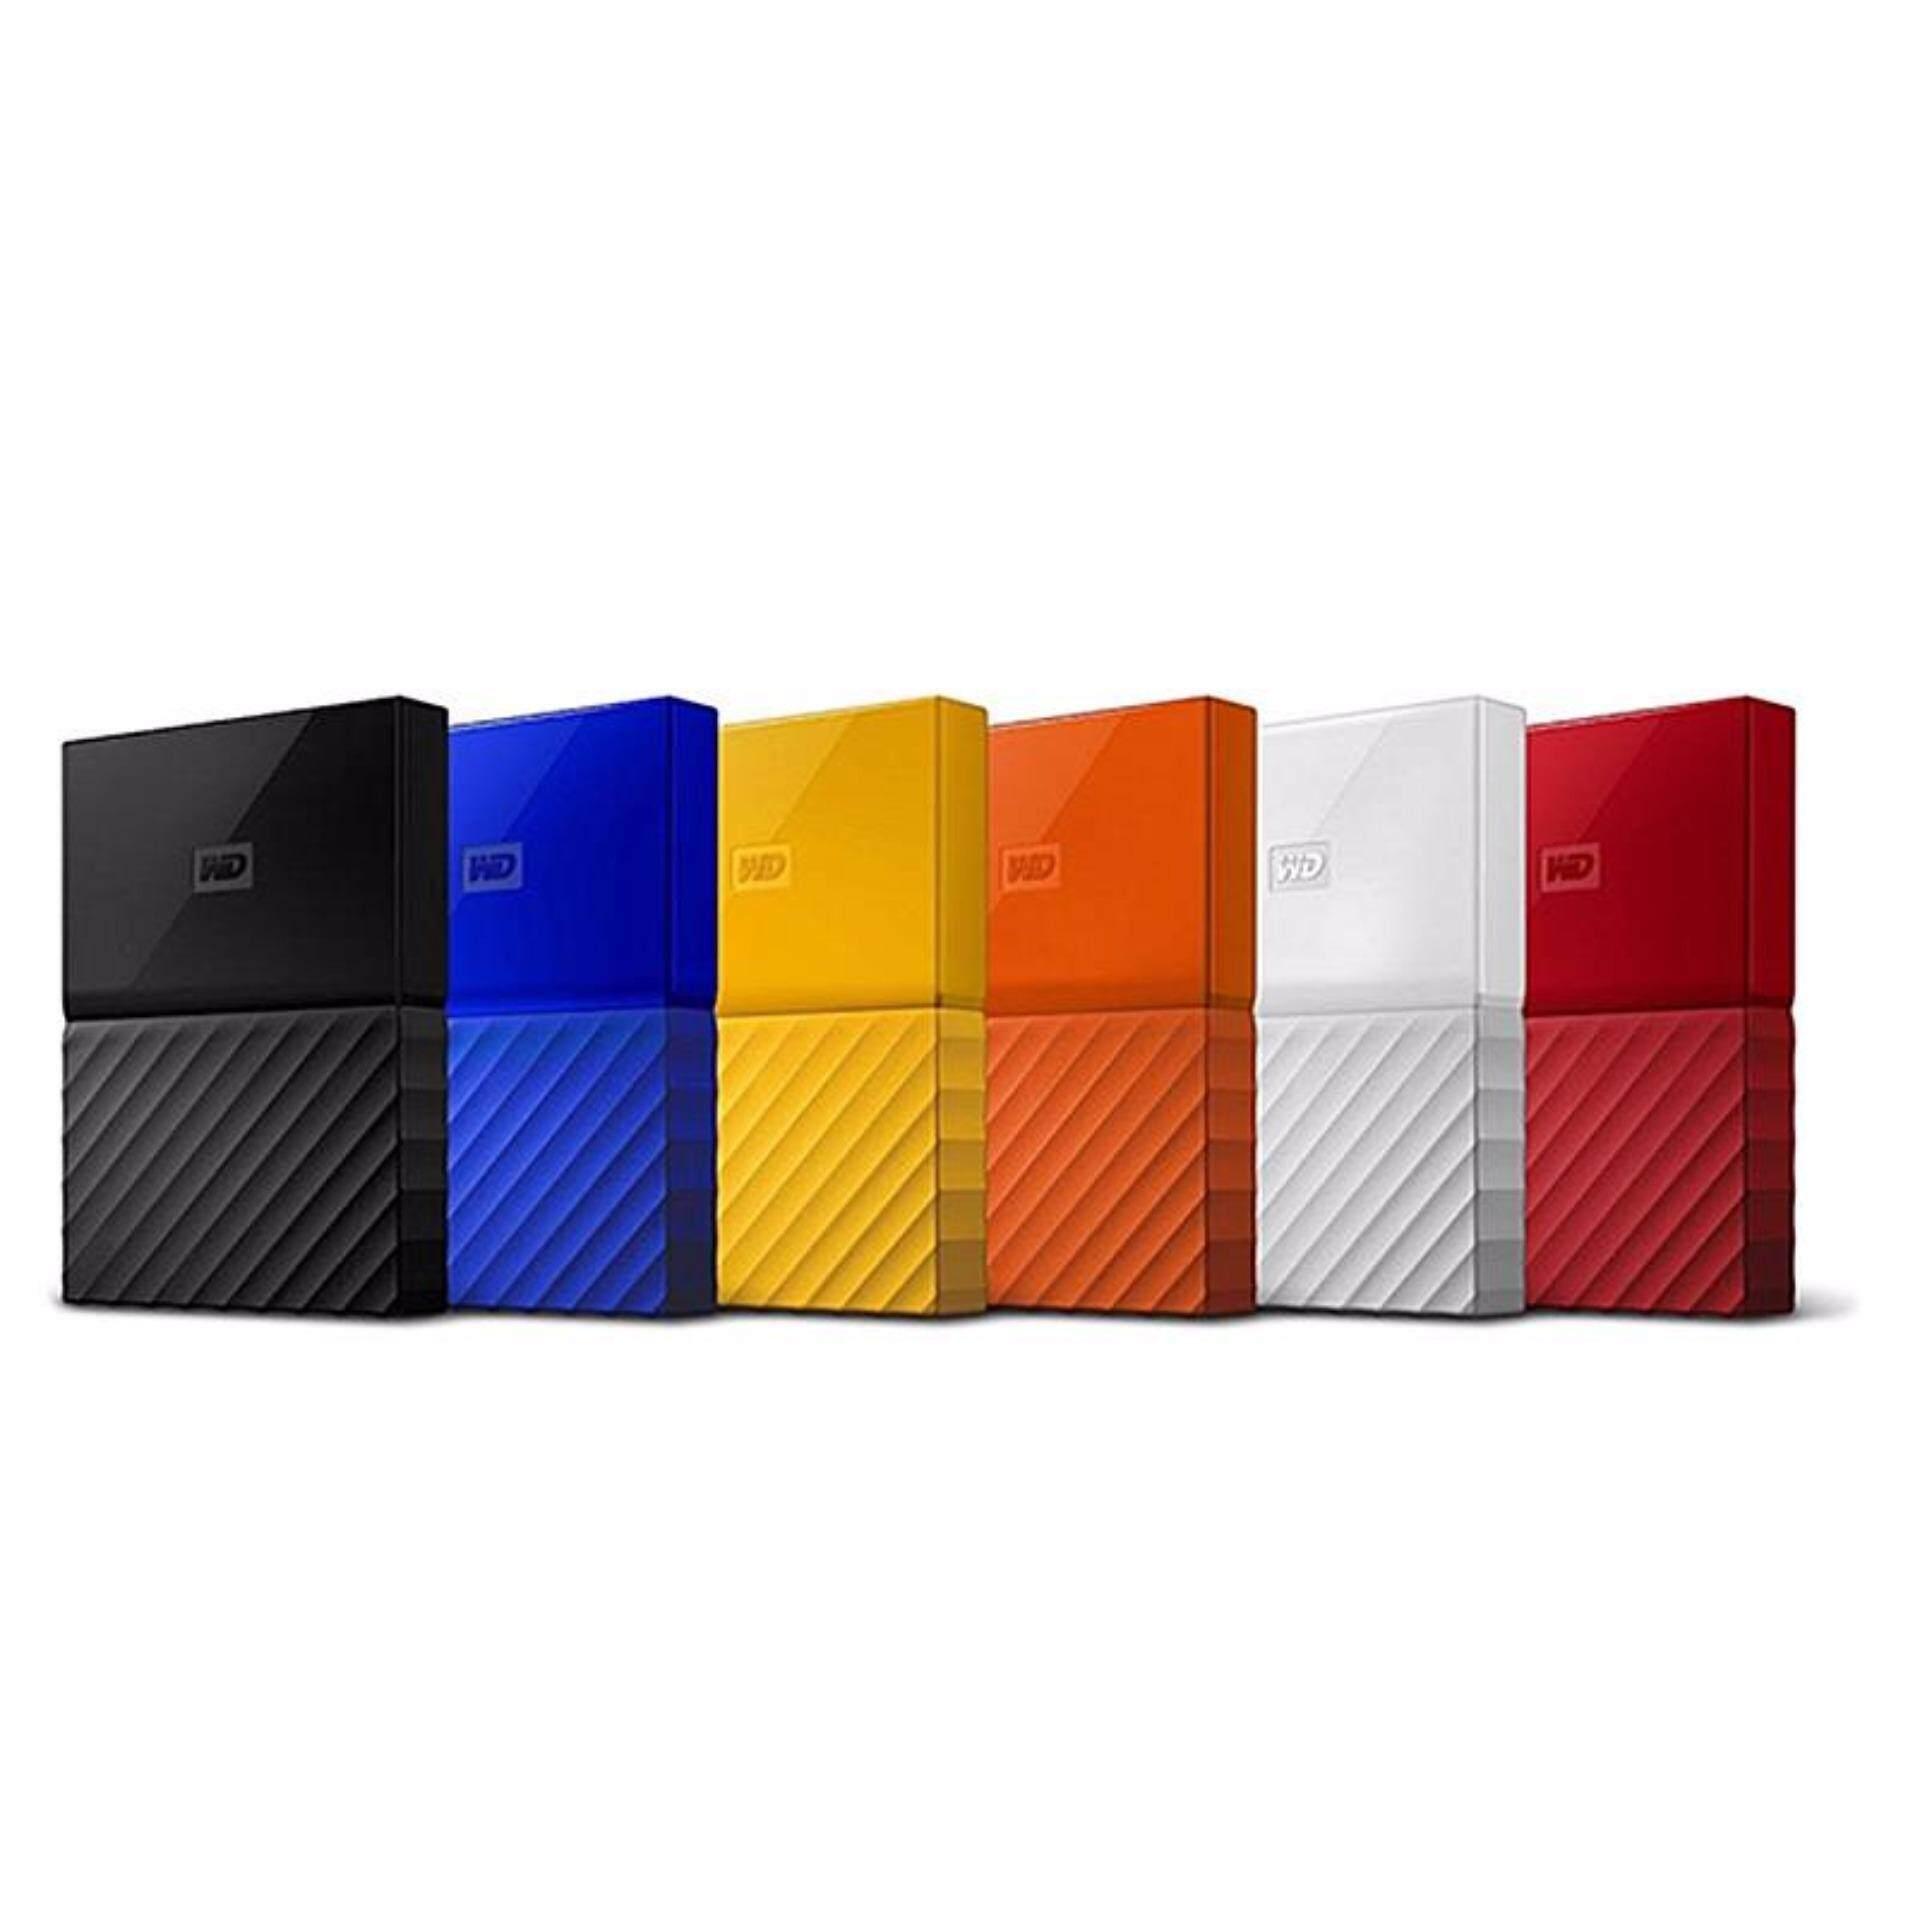 WD Western Digital HDD My Passport ( 1TB ) Portable Storage External Hard Disk Drive (ORIGINAL/ READY STOCK) - BLUE